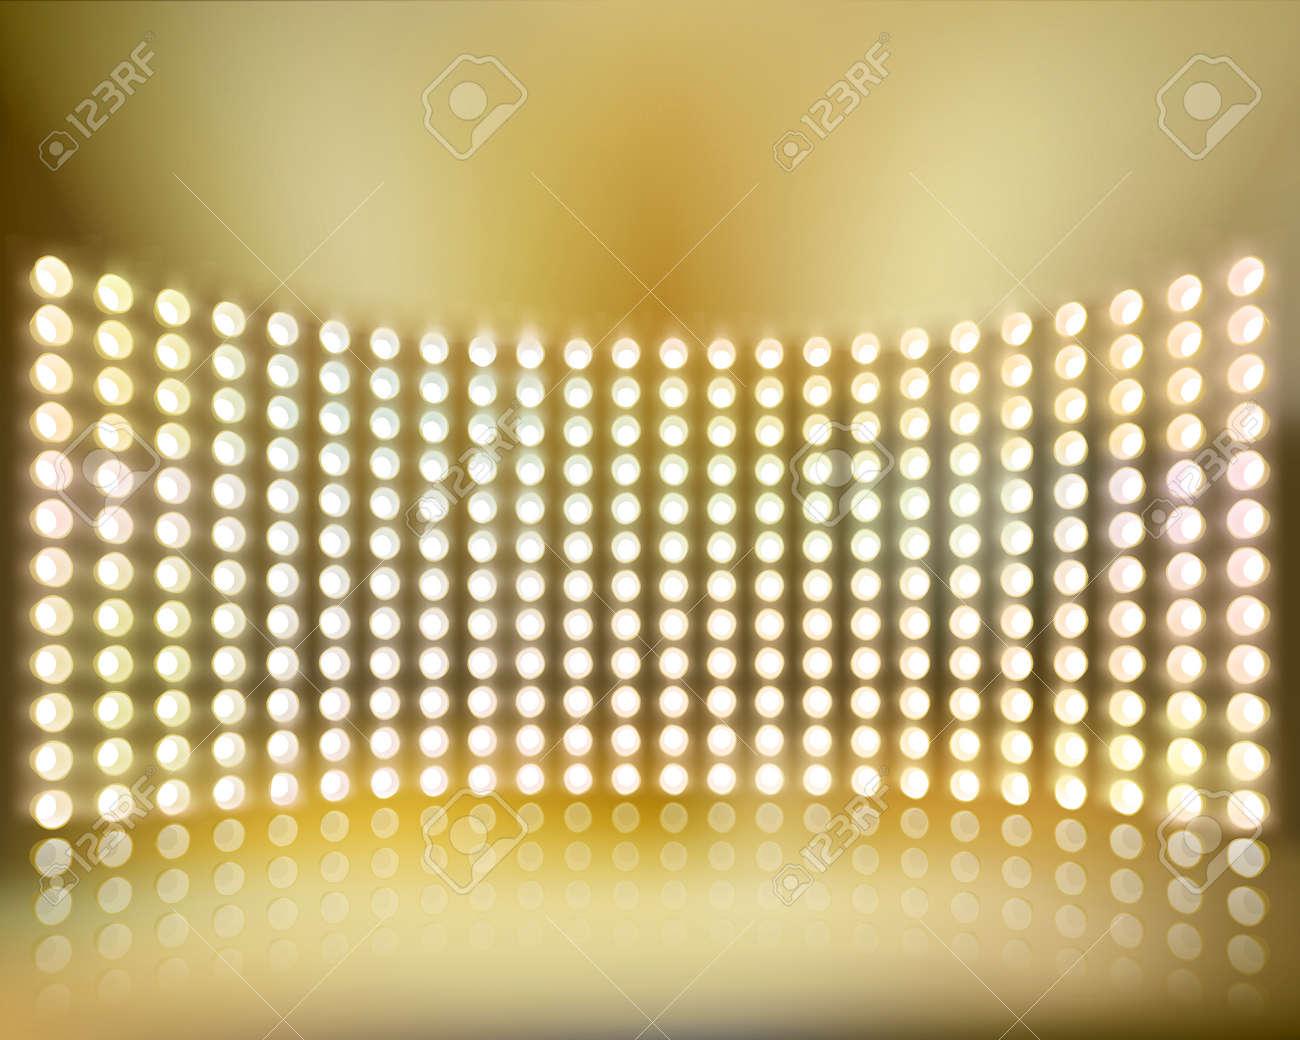 Light show. Vector illustration. - 37399677